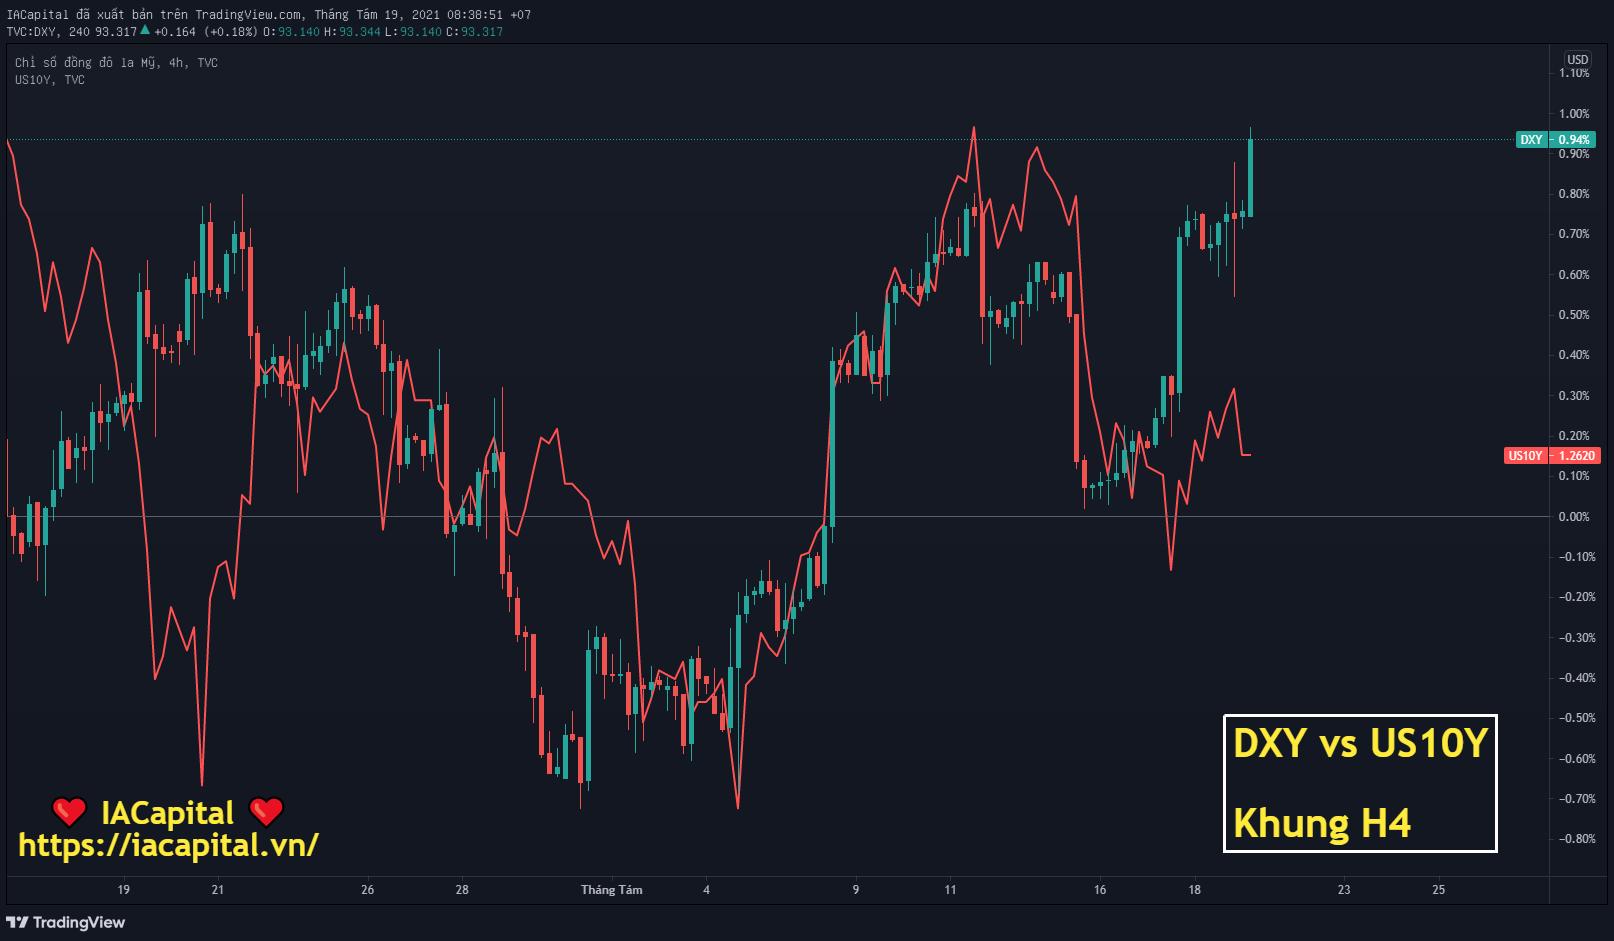 https://s3.tradingview.com/snapshots/6/6zzOgt3z.png